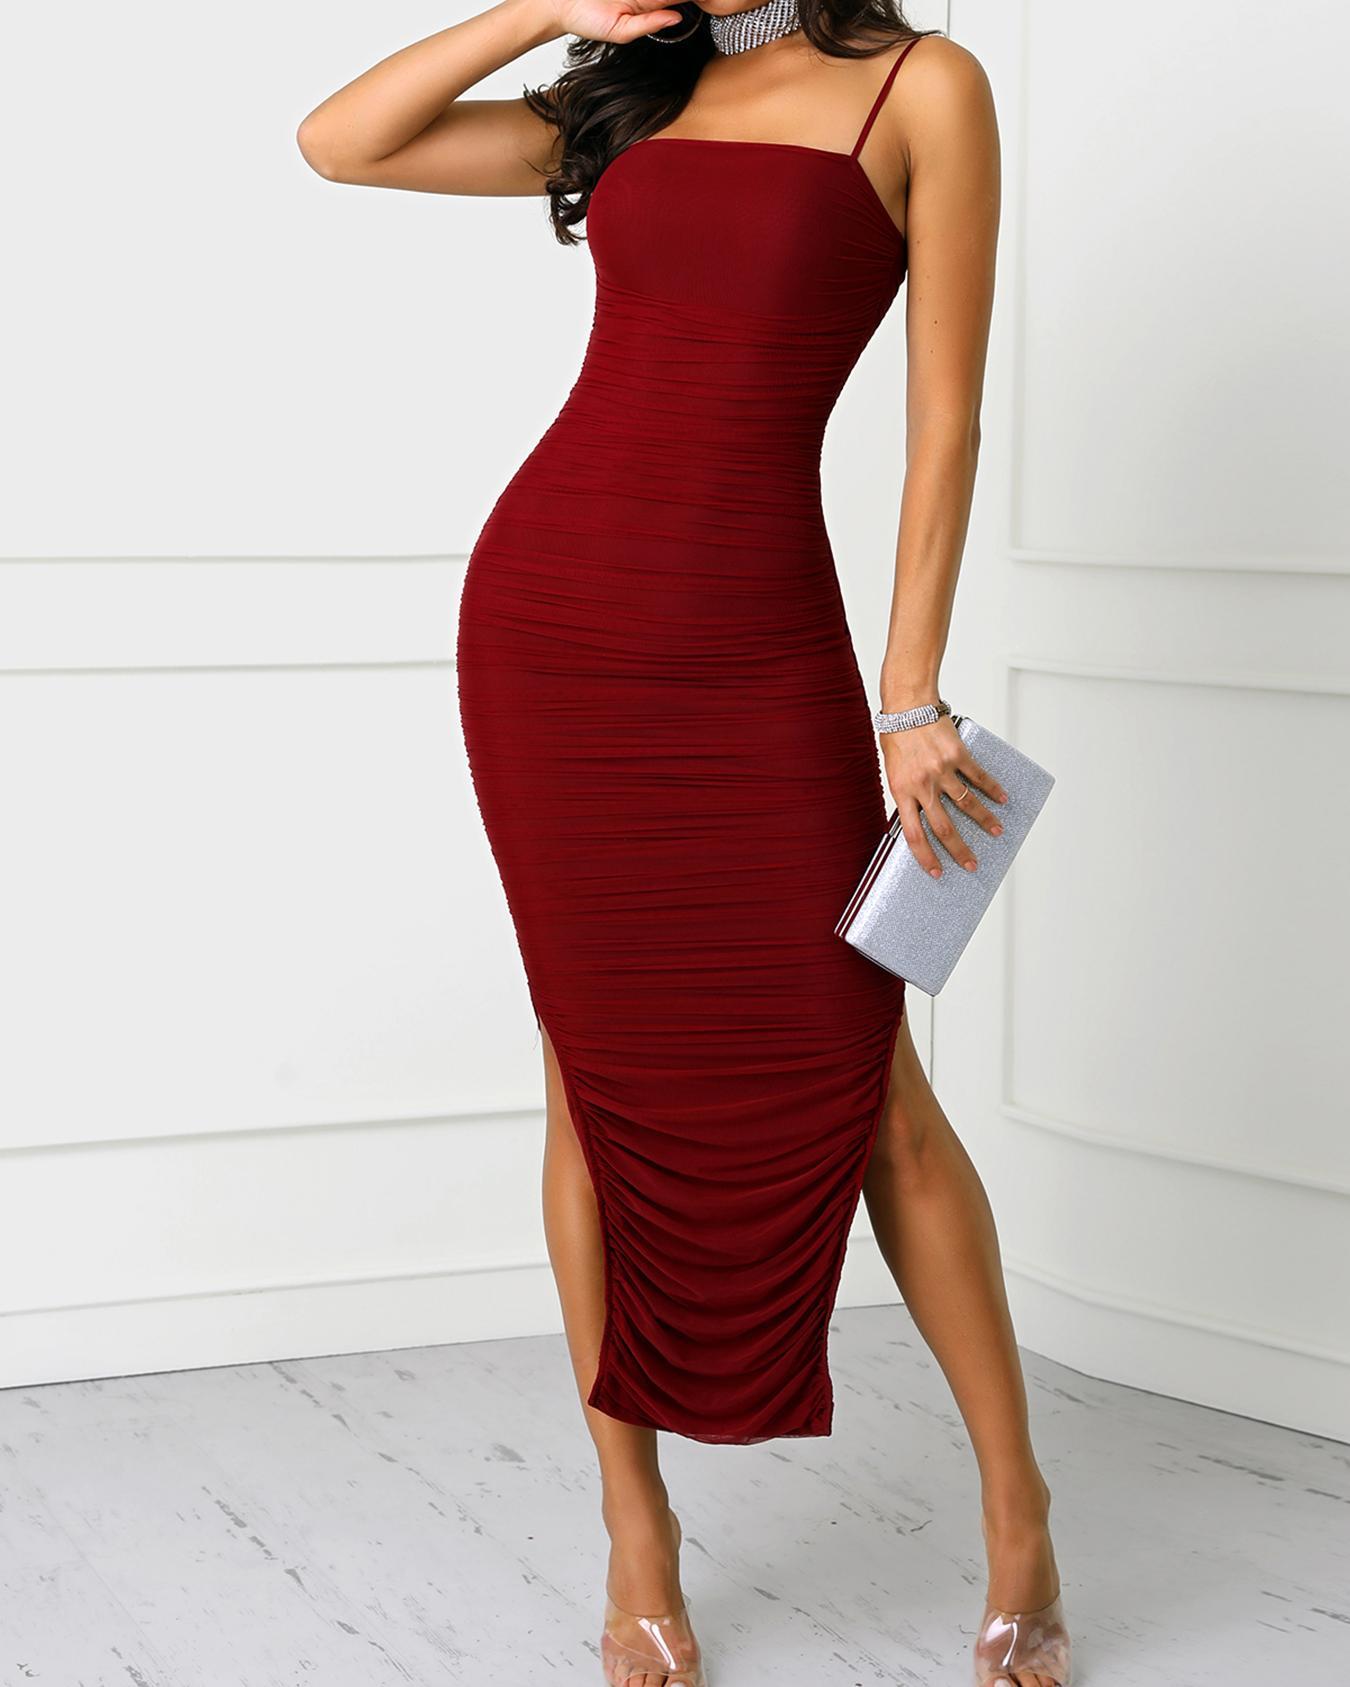 Spaghetti Strap Scrunched Side Slit Party Dress